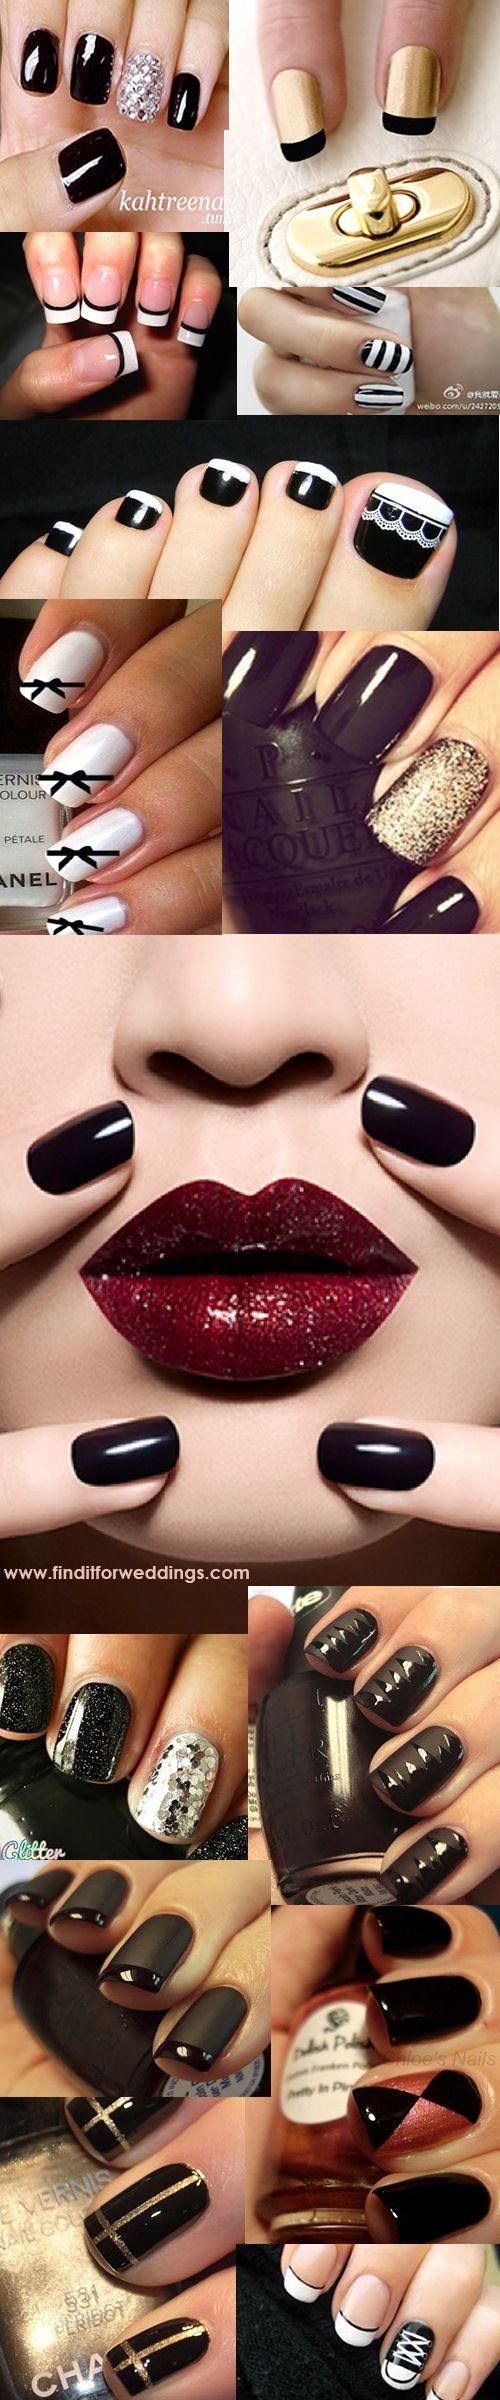 Black# Nails Black nail designs www.finditforweddings.com